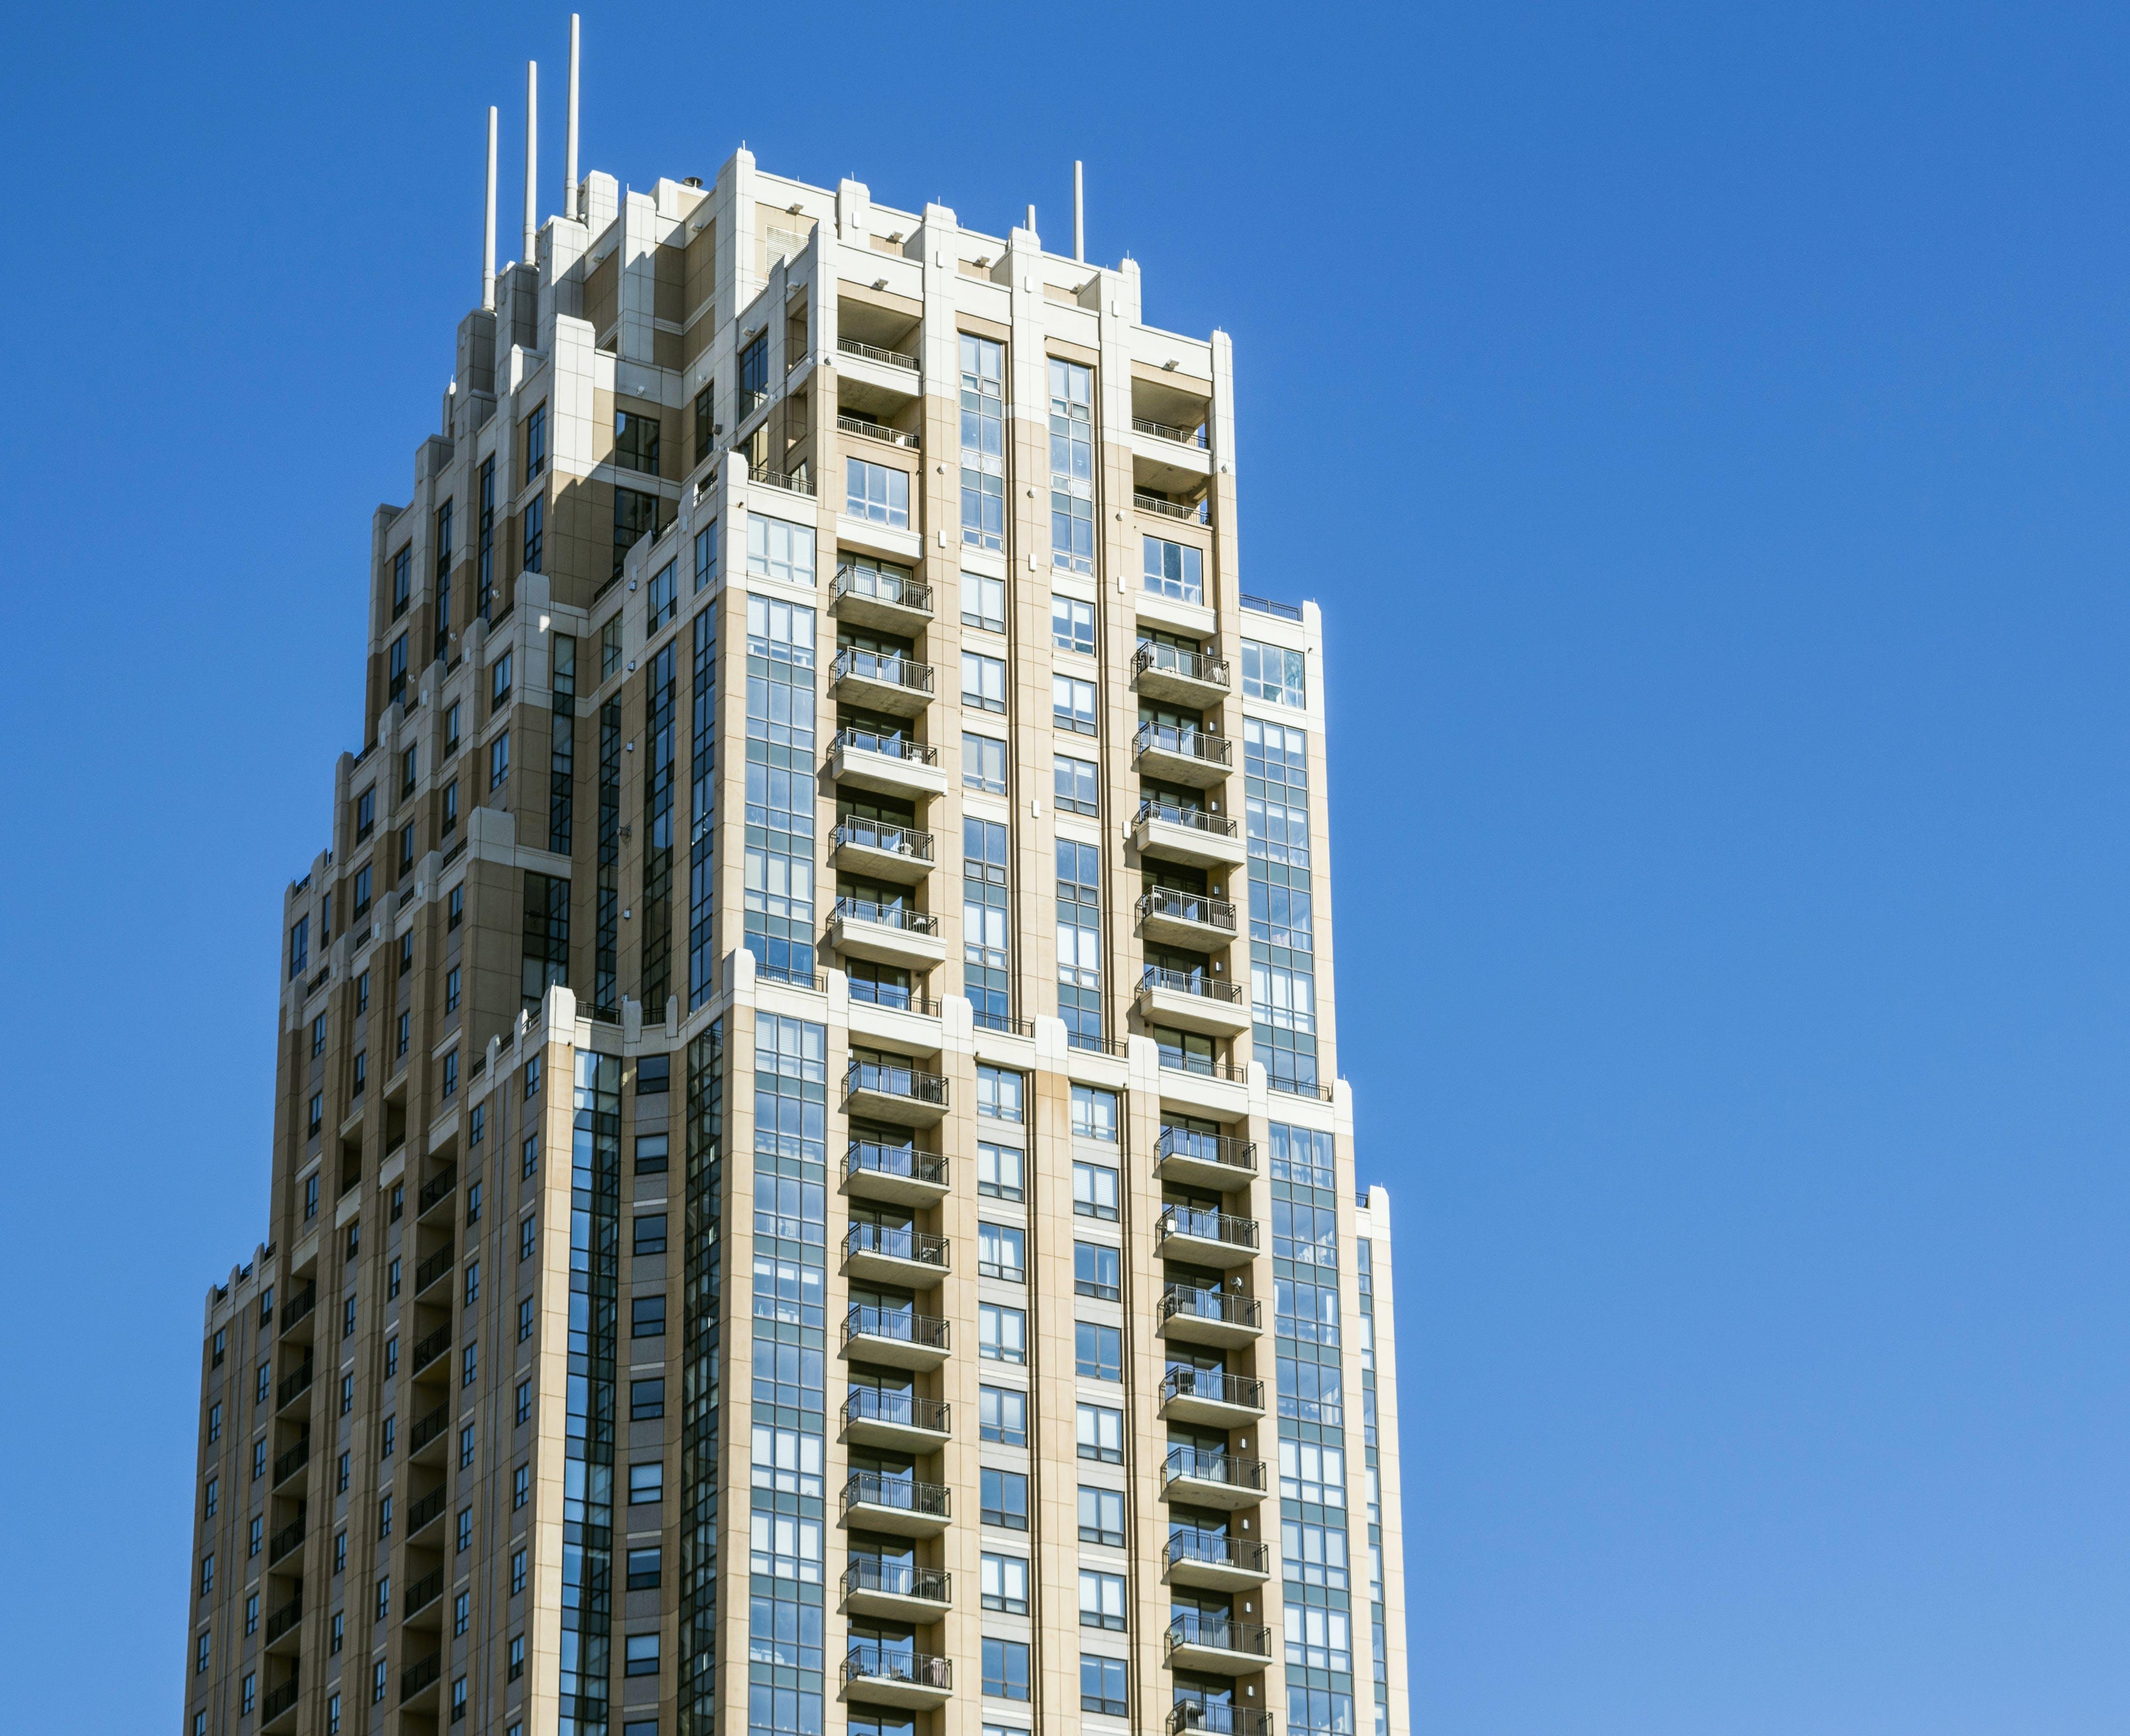 Photo of Concrete Building